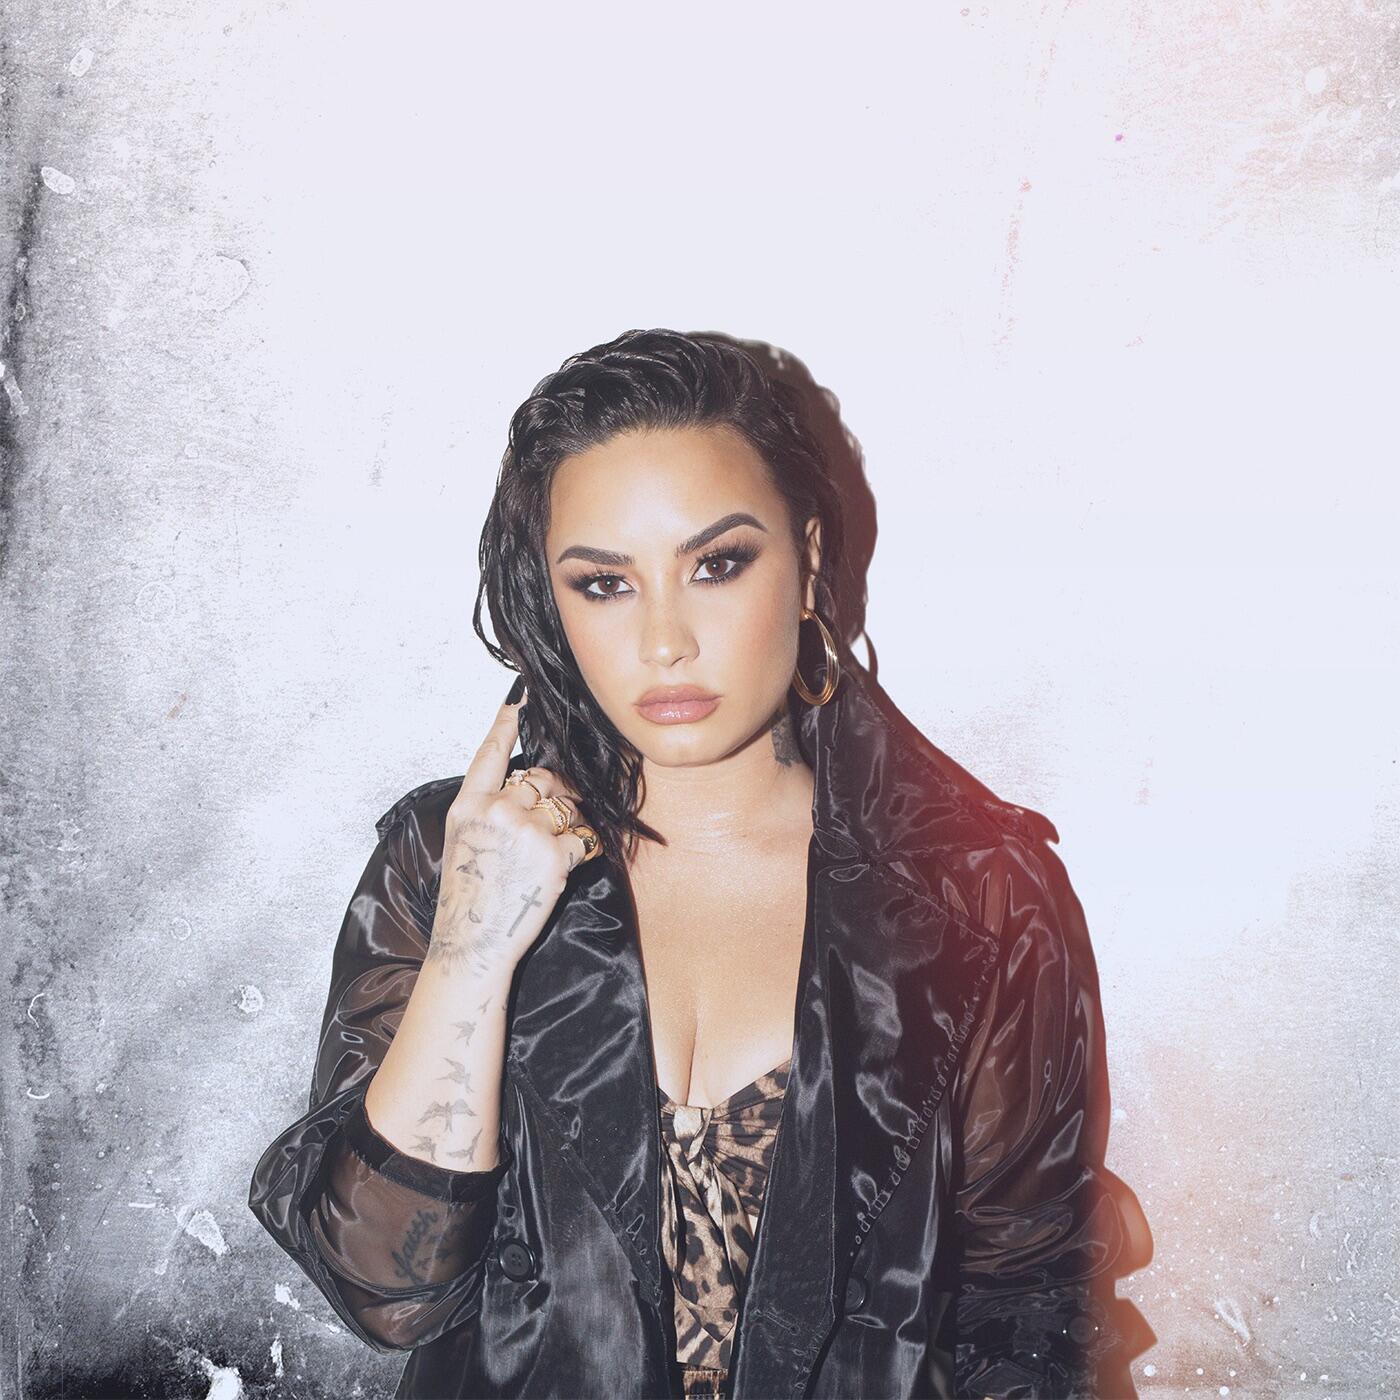 Demi Lovato Radio: Listen to Free Music & Get The Latest Info